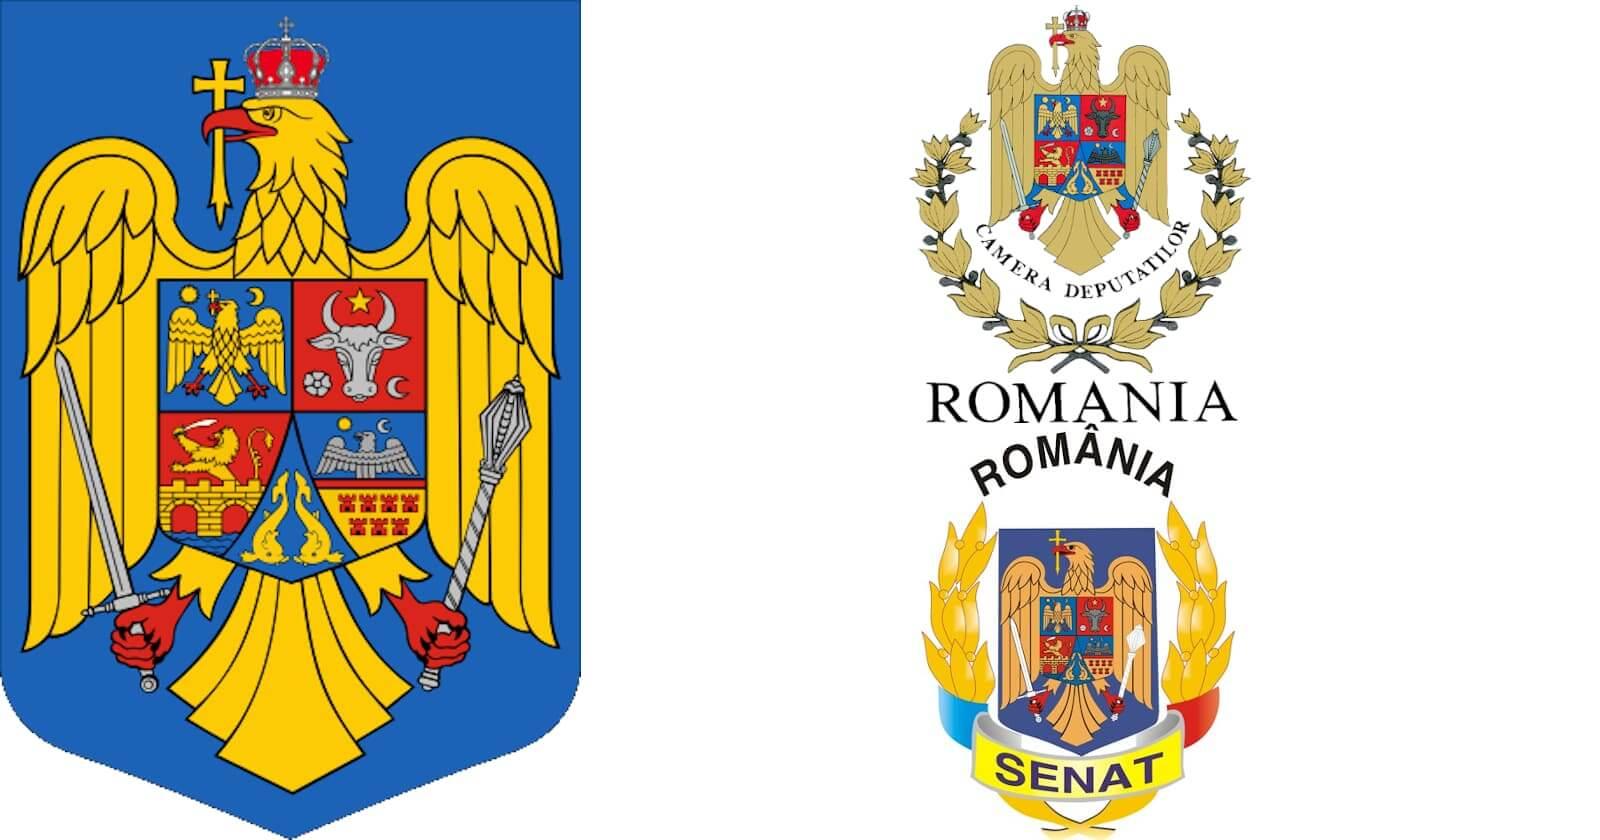 https://ziarul.romania-rationala.ro/control/articole/articole/parlamentul-romaniei-banner.jpg